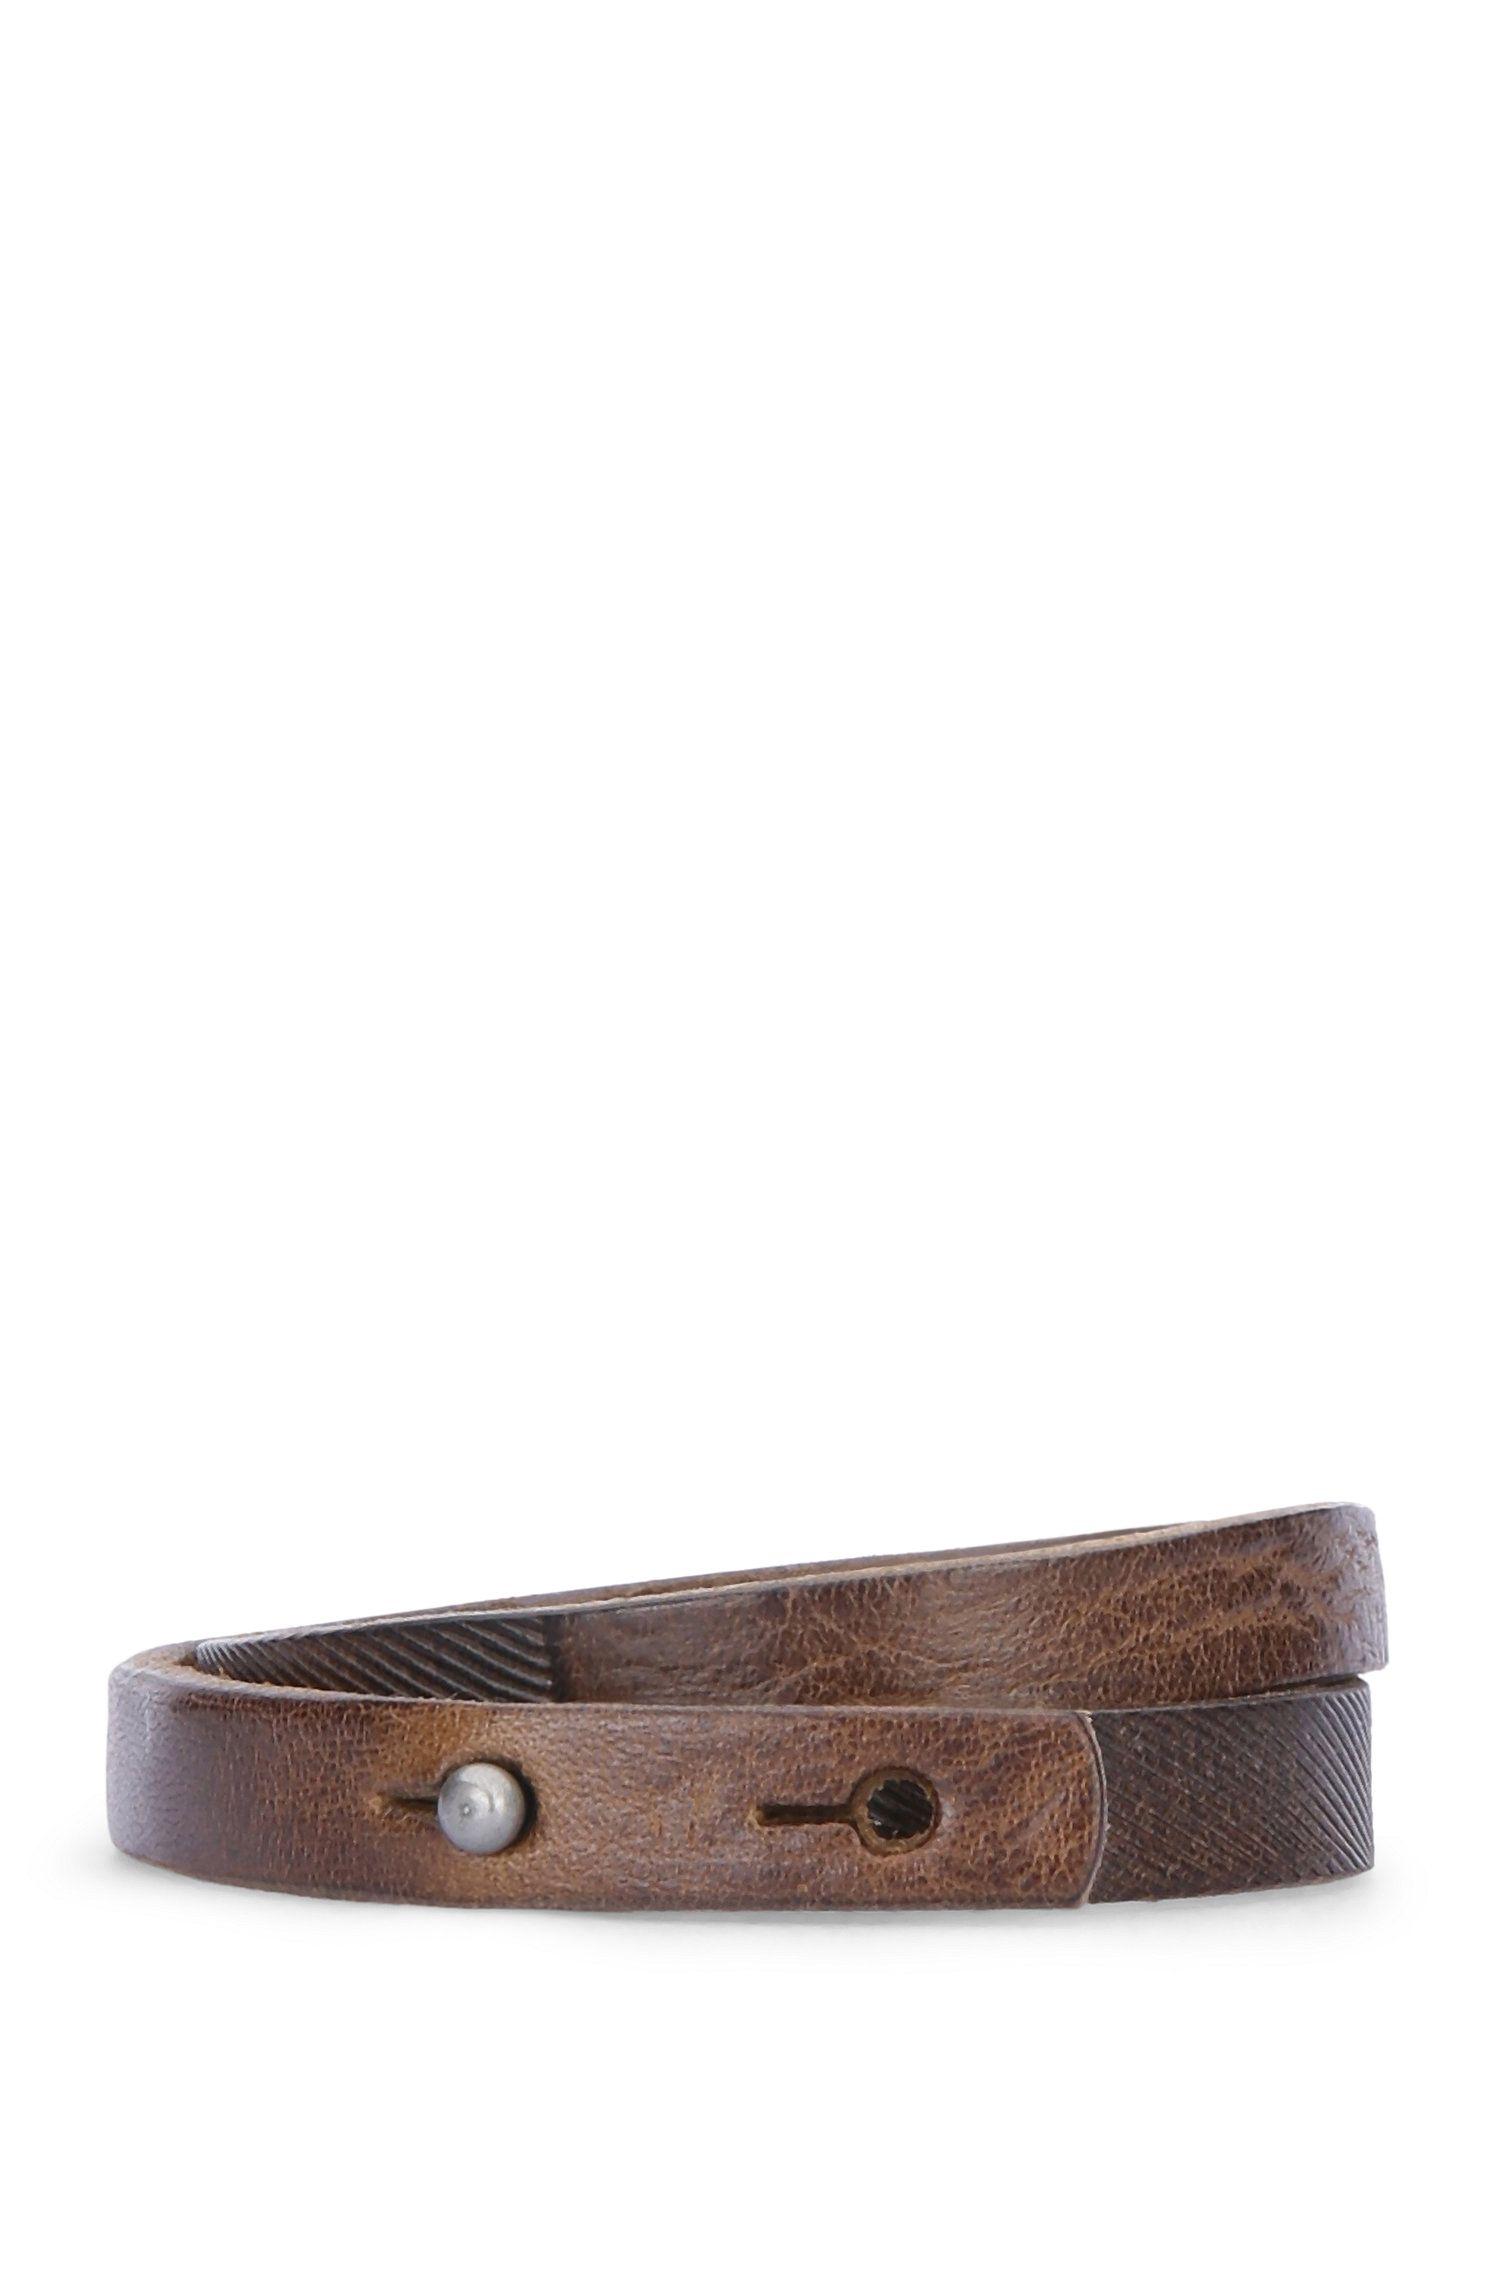 'Morrison' | Leather Etched Wrap Bracelet